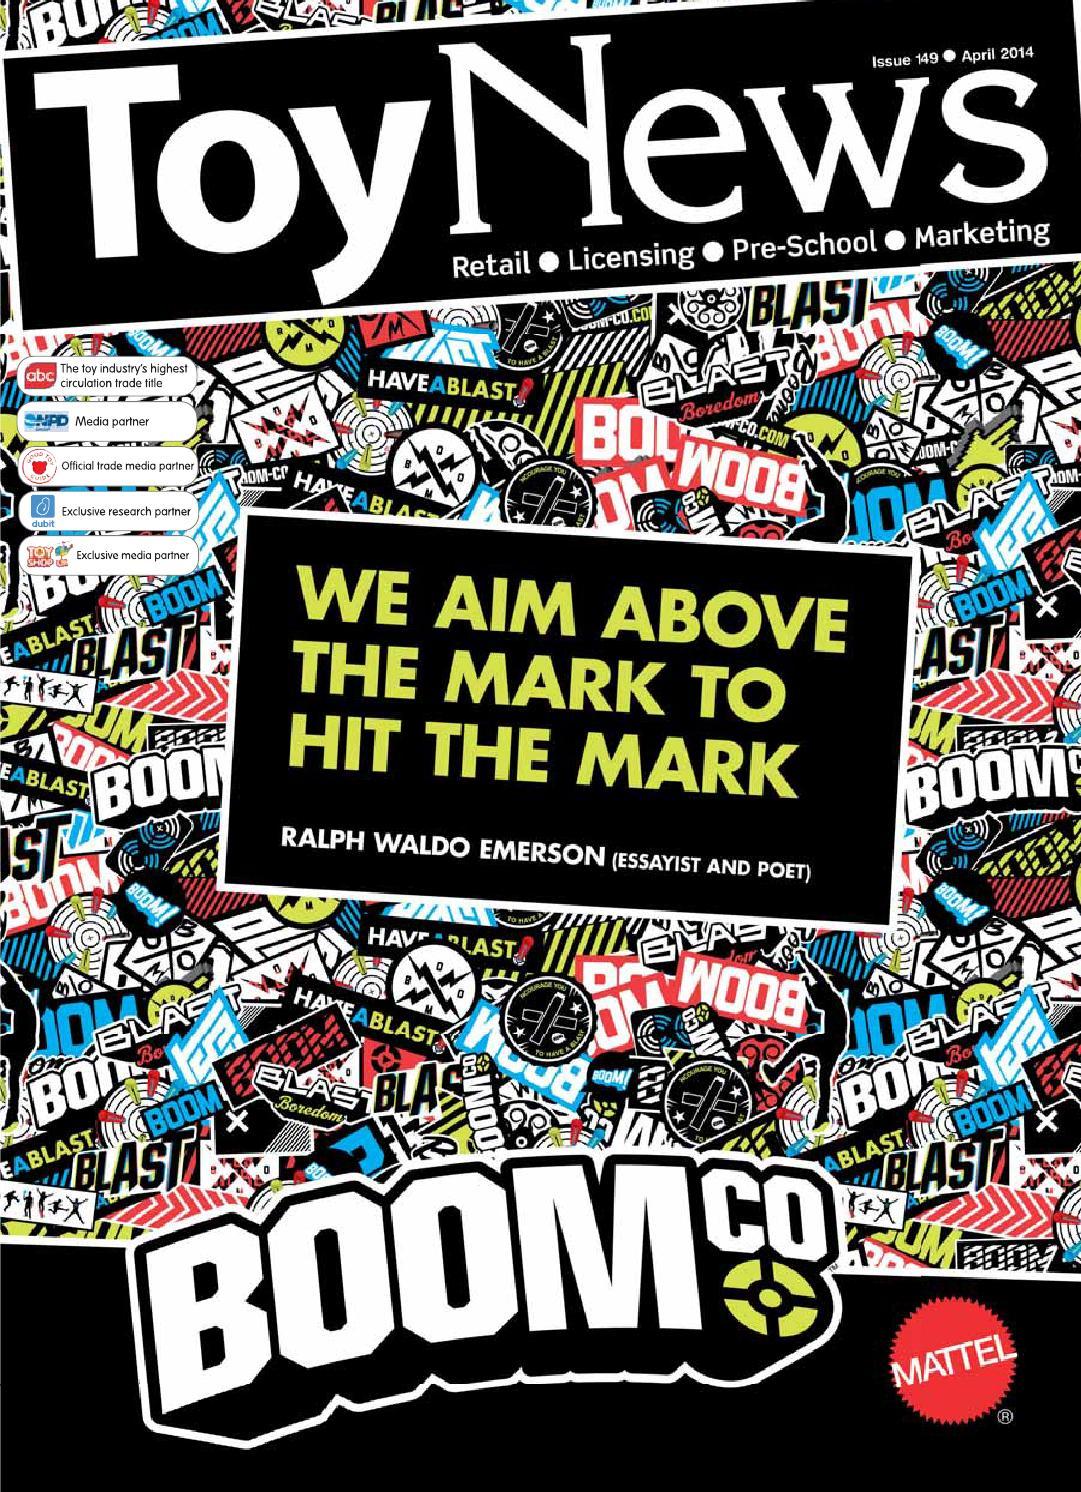 ToyNews Issue 149 April 2014 by Future PLC - issuu